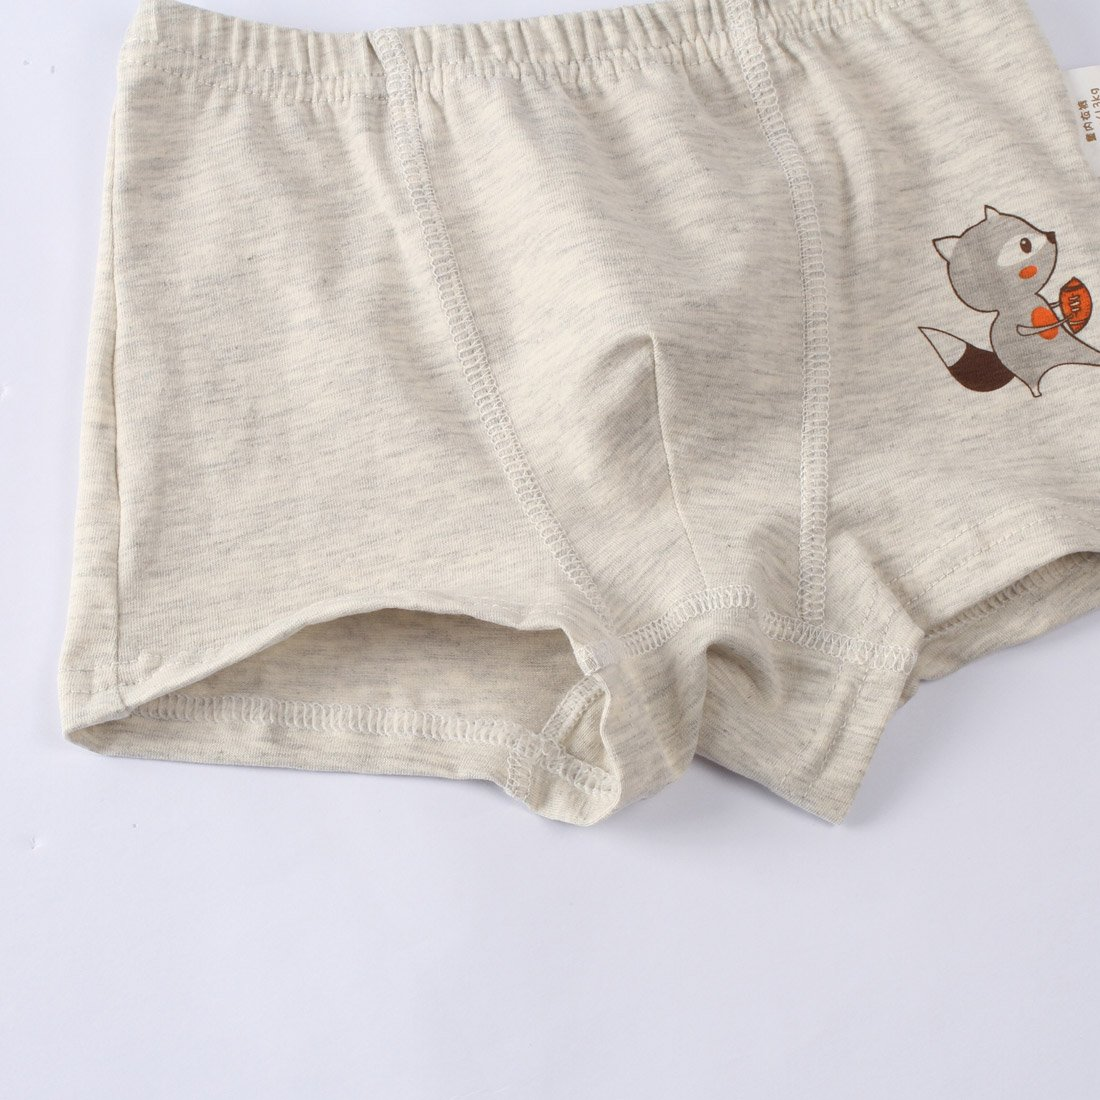 Joyo roy Boys Boxer Shorts Boys Underwear Soft Cotton Underwear Boxers Ages 2-6+